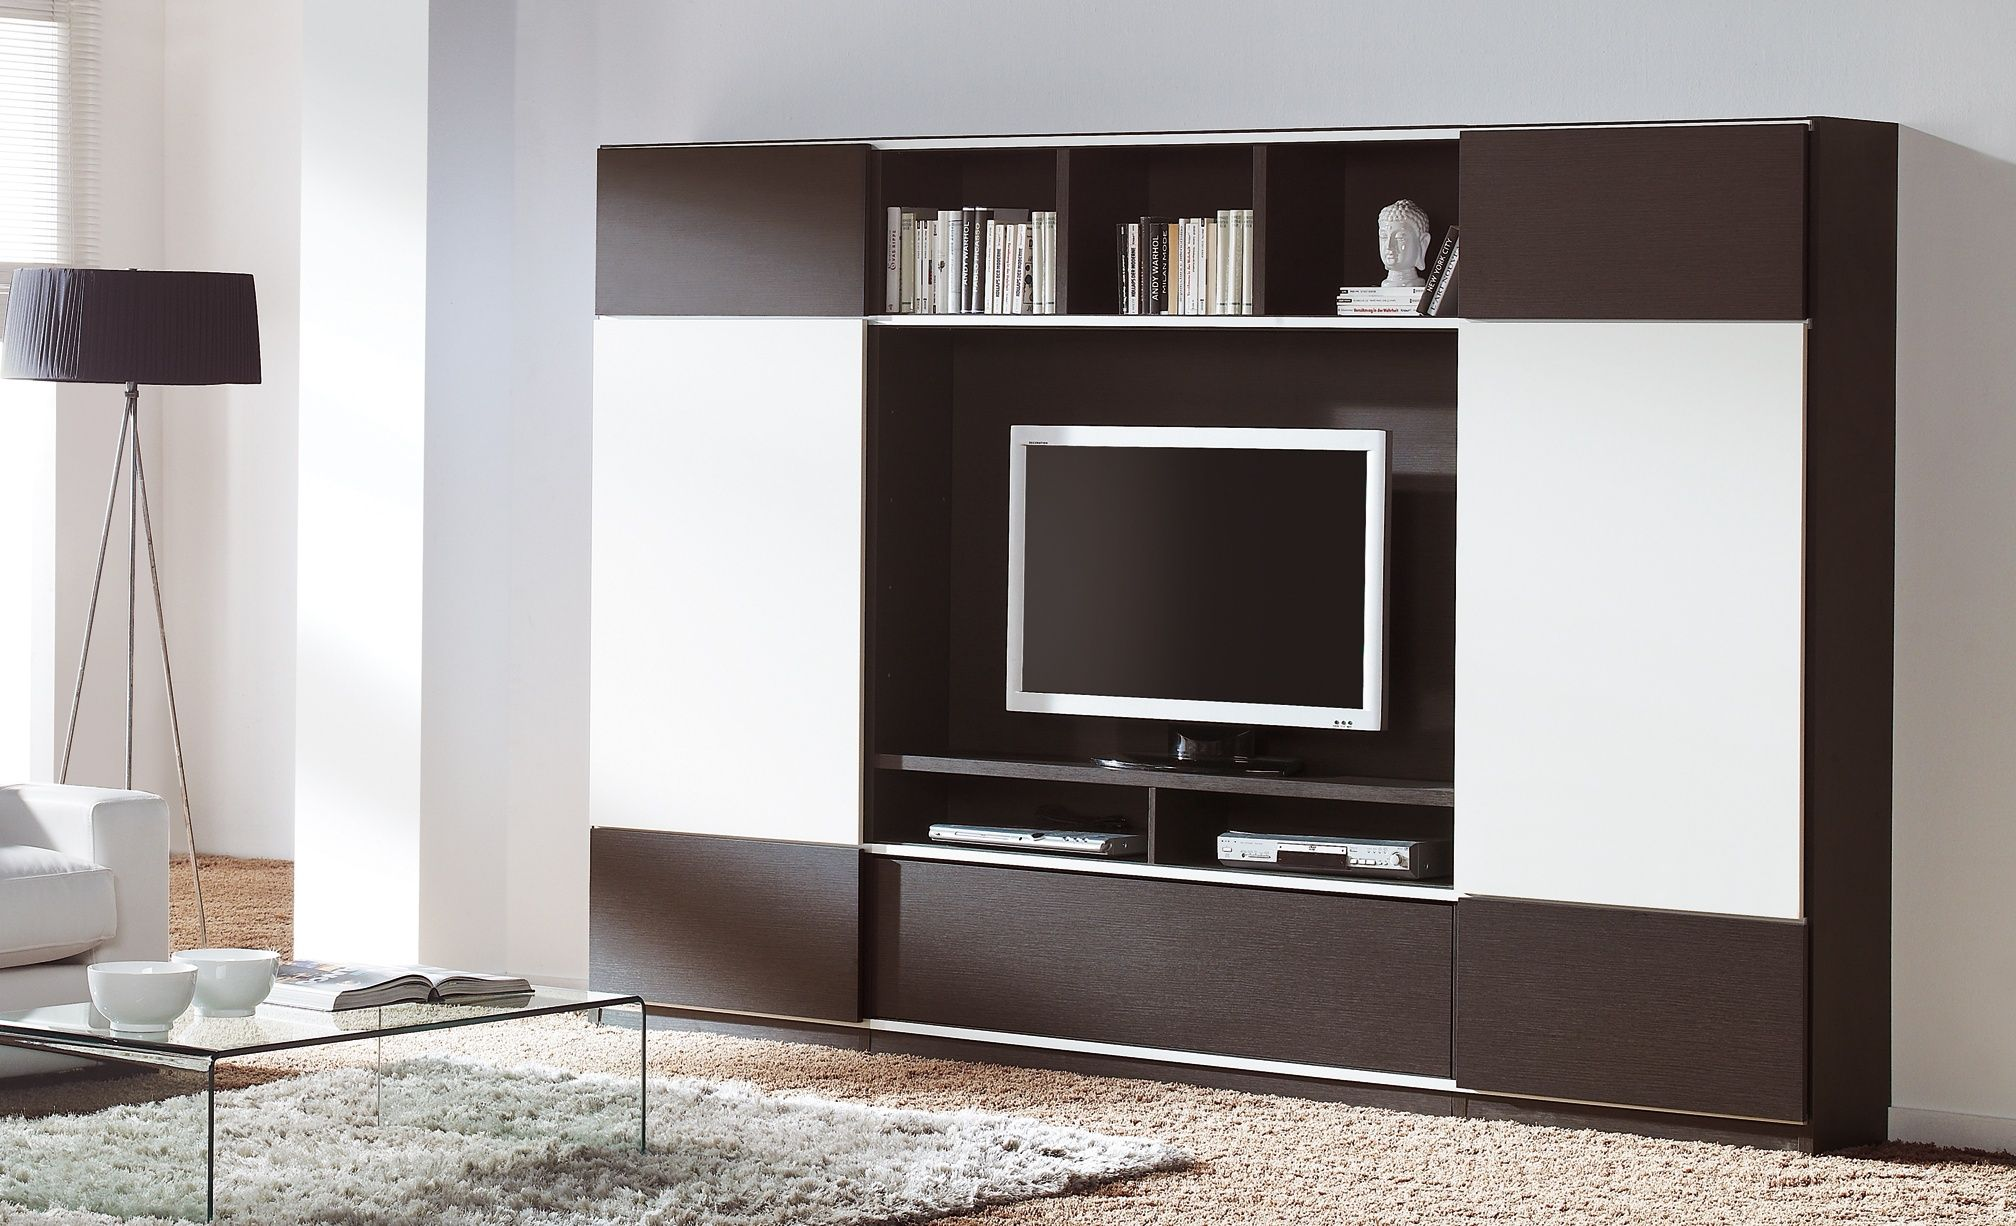 Furniture Living Room Cabinets  חיפוש בGoogle  Furniture Pleasing Cabinet Living Room Design Design Ideas